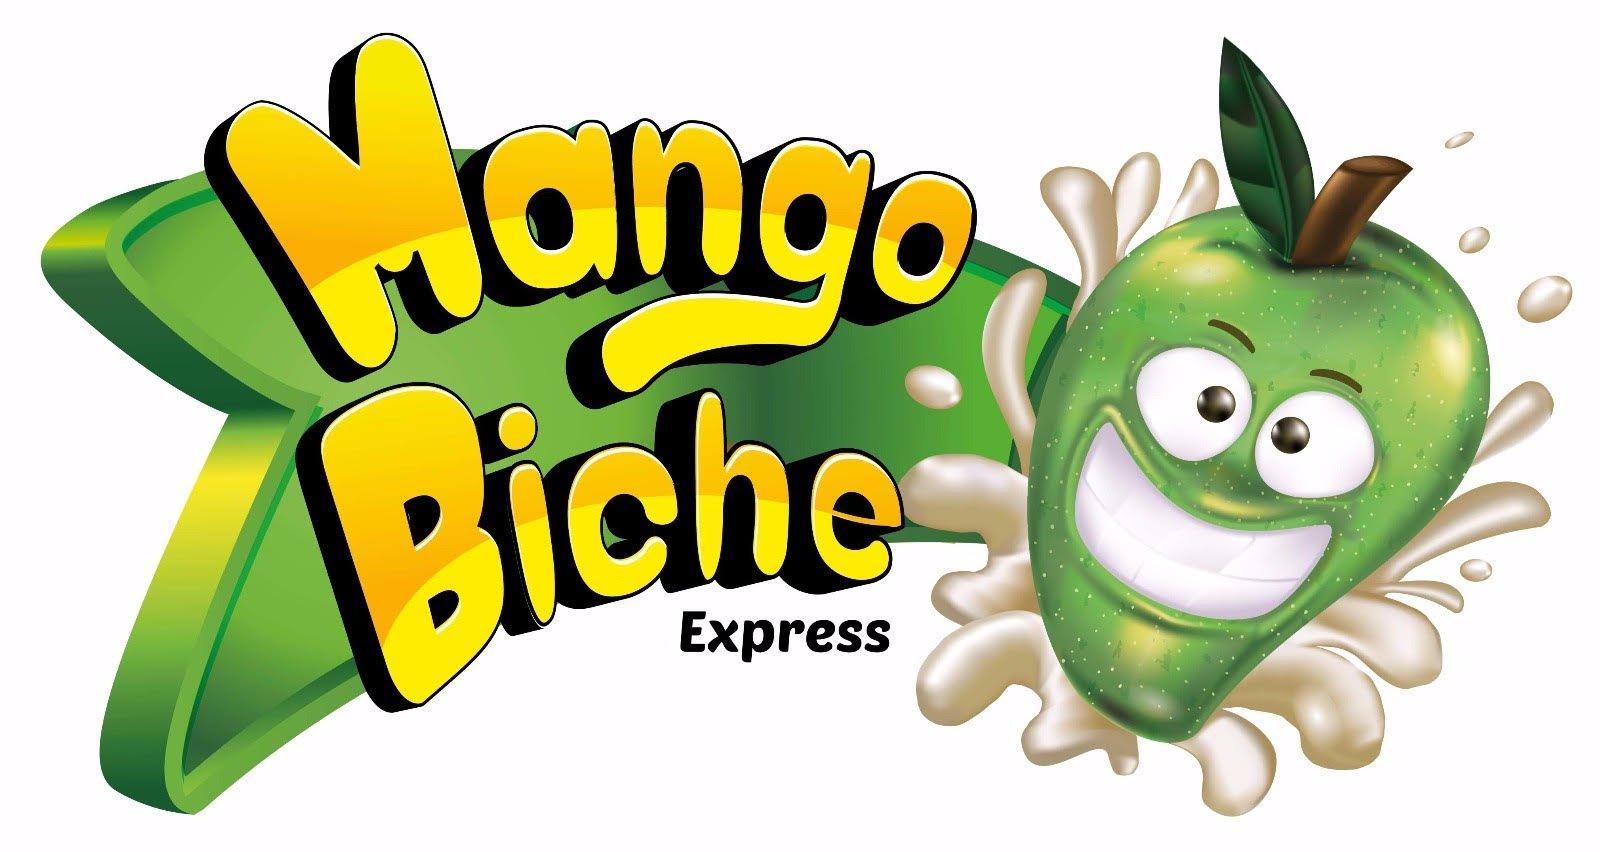 Mango Biche Express CC Mall Plaza Manizales